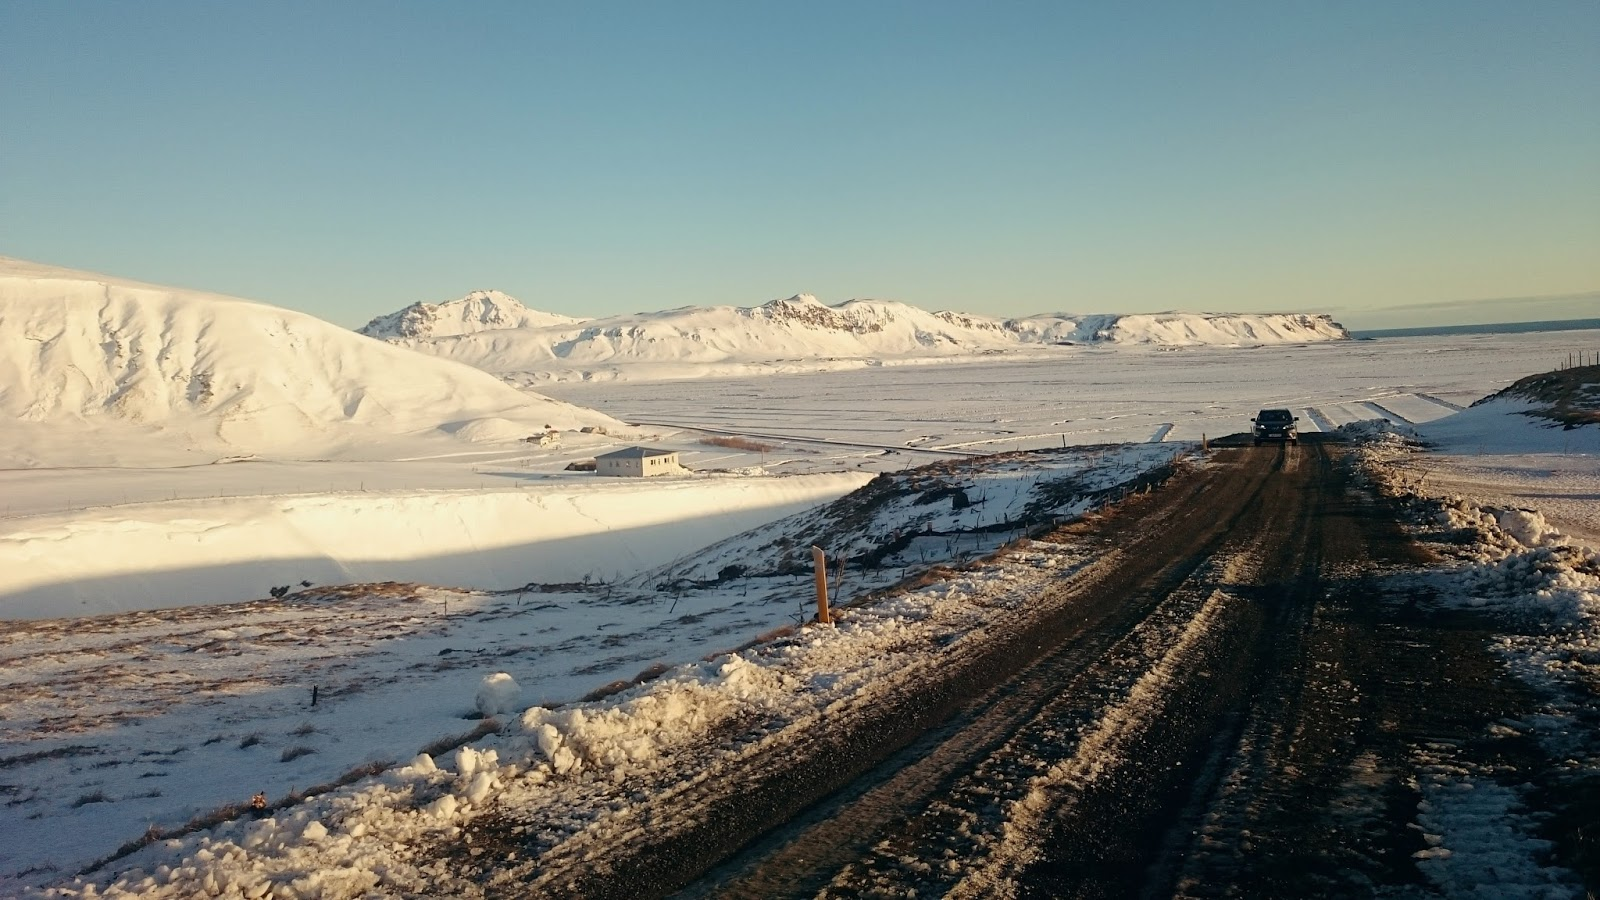 zima w Islandii, Islandia, islandzka zima, Islandia zdjęcia